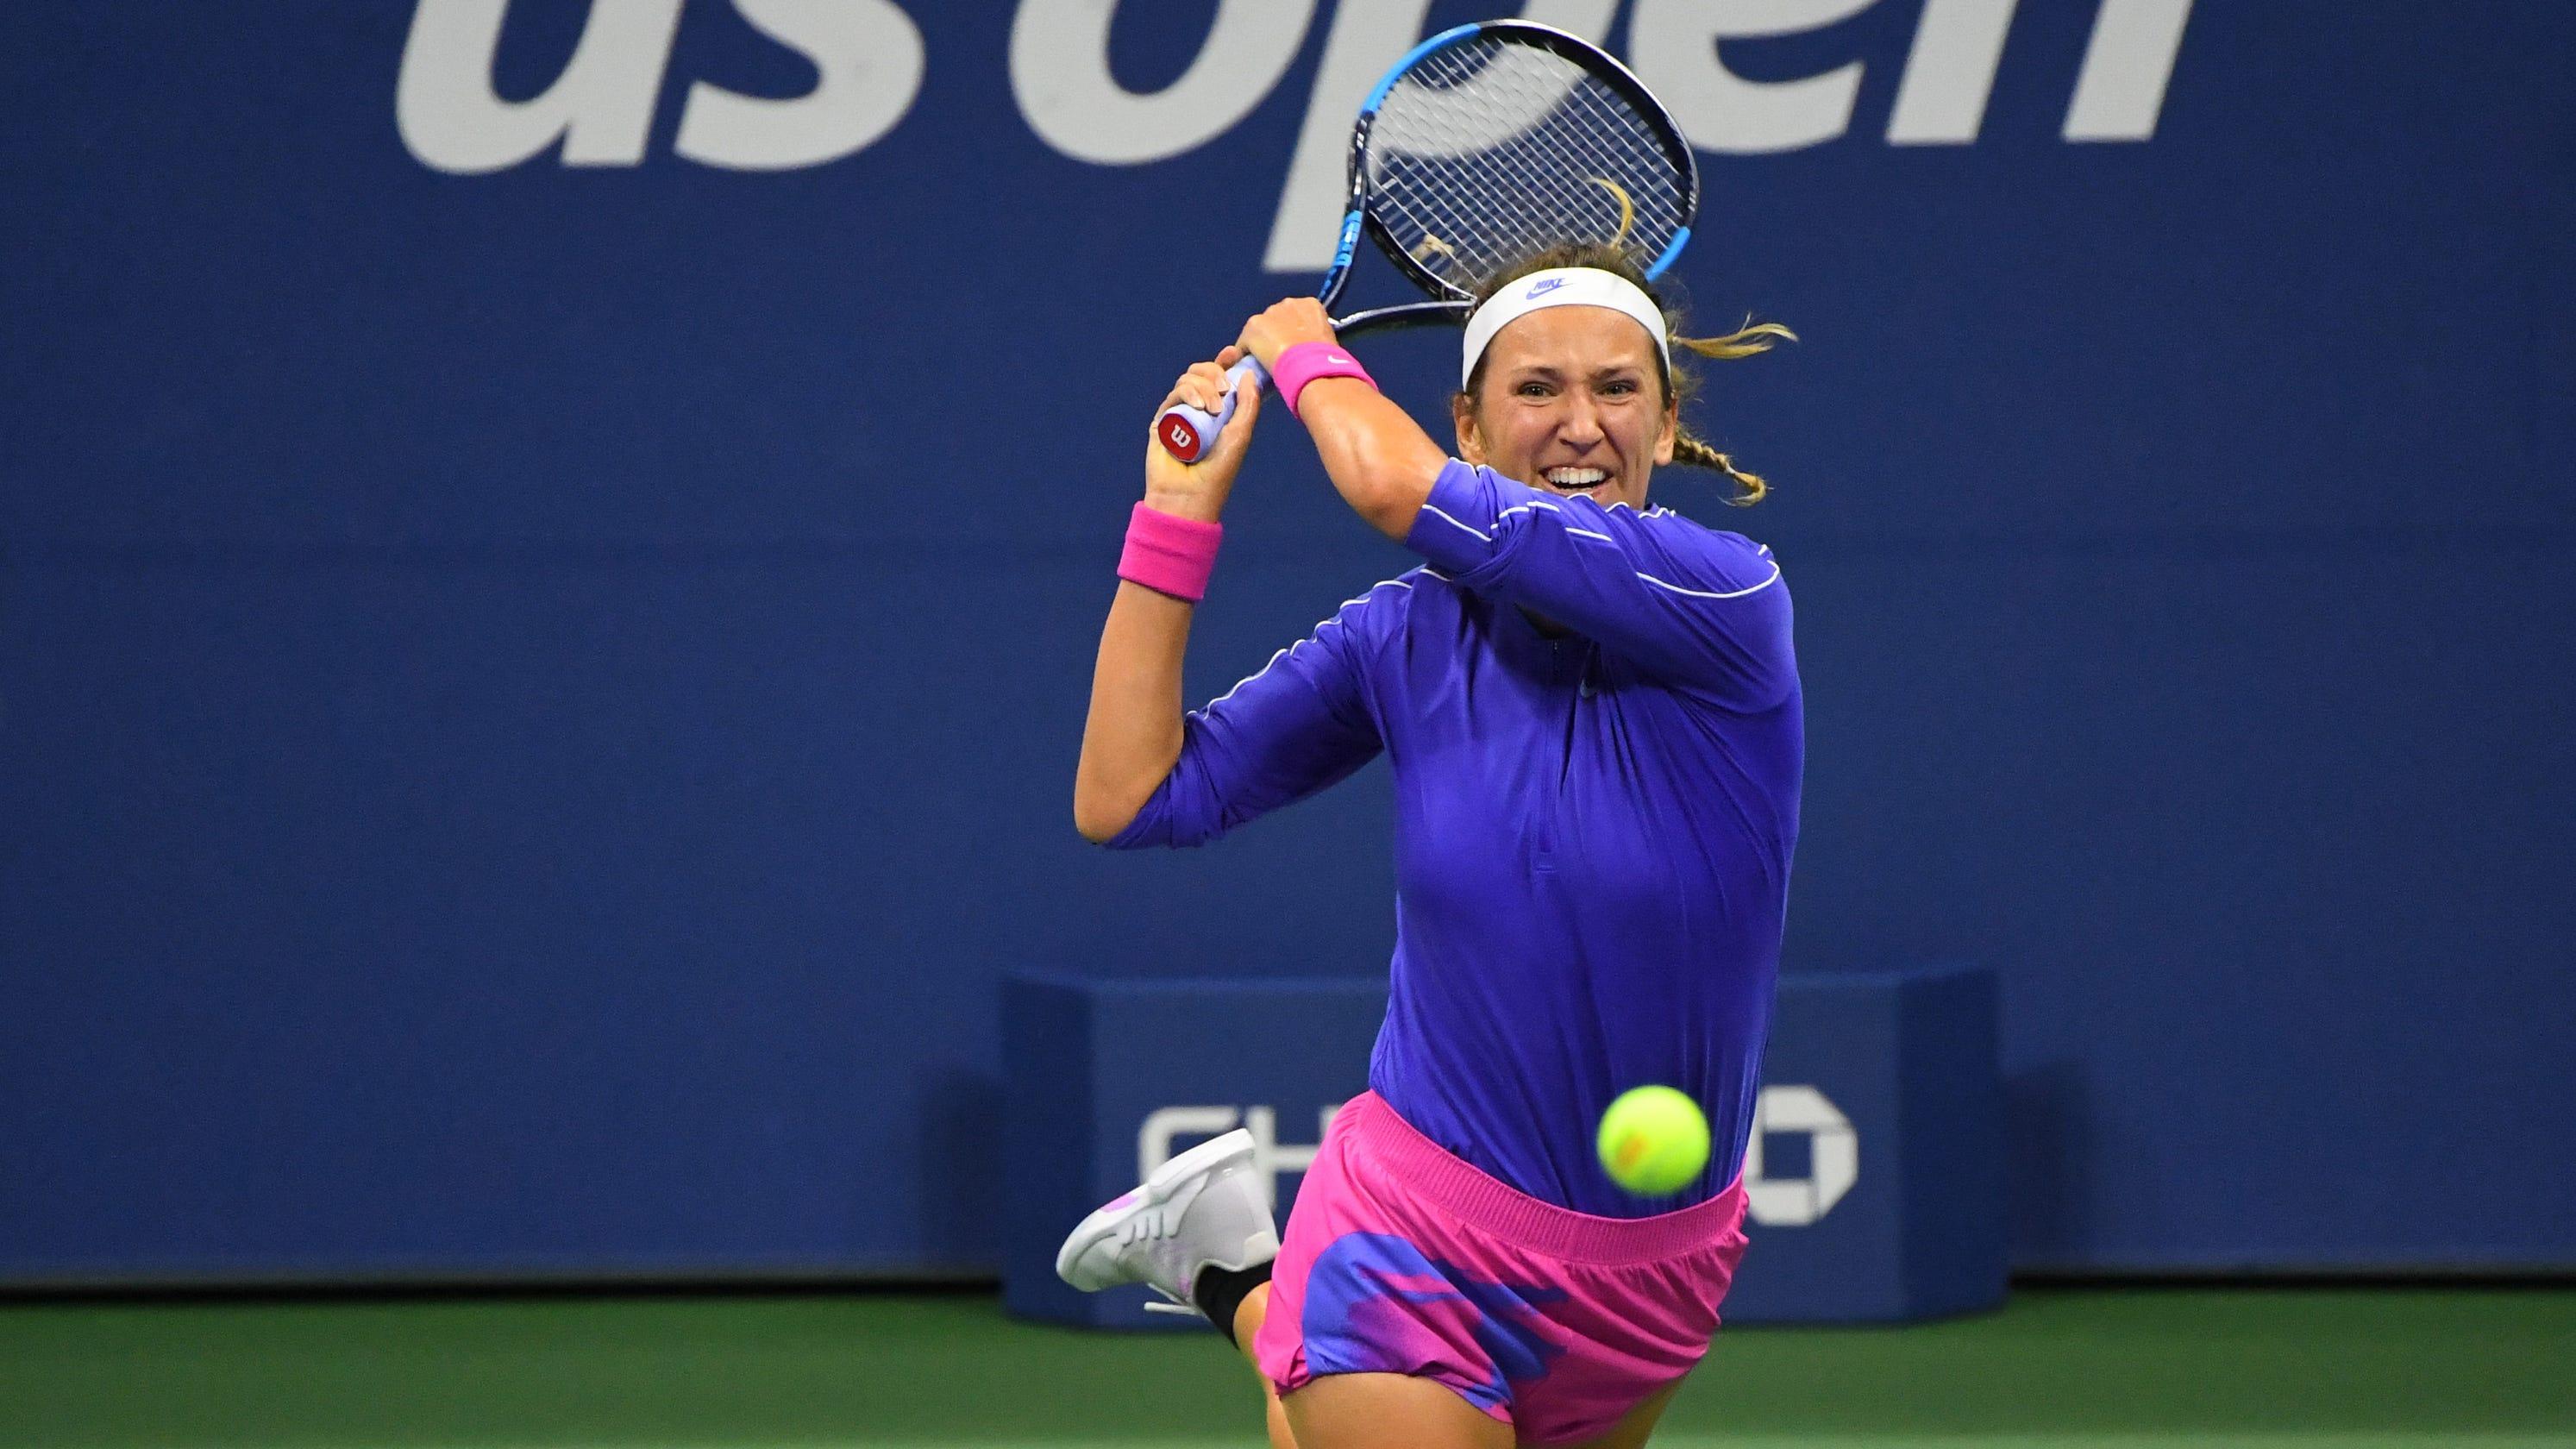 Serena Williams, Victoria Azarenka finally meet again, in US Open